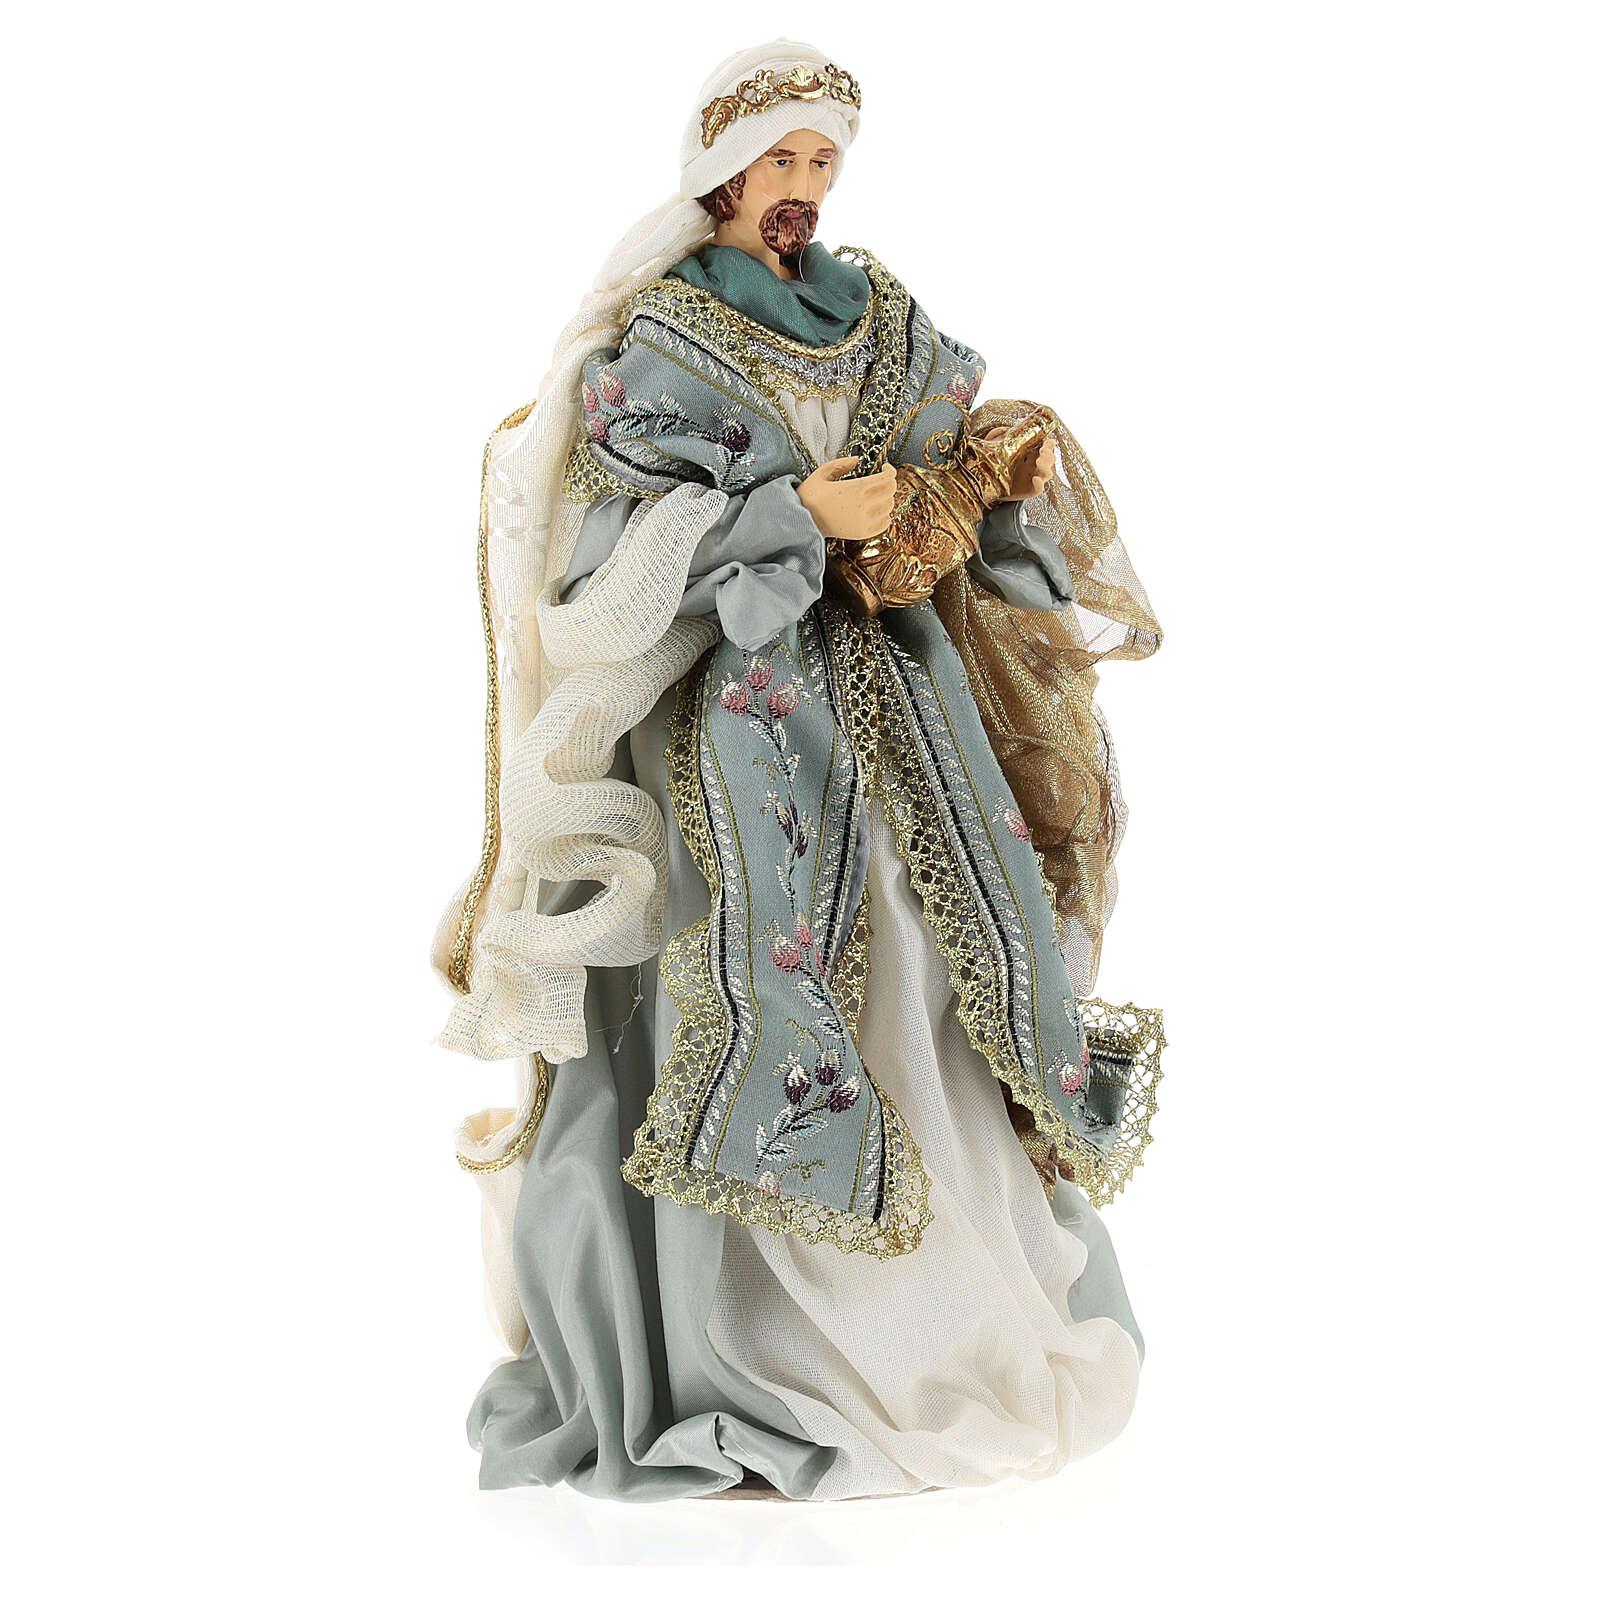 Natività 6 pezzi Blu Gold resina stoffa 40 cm stile veneziano 4